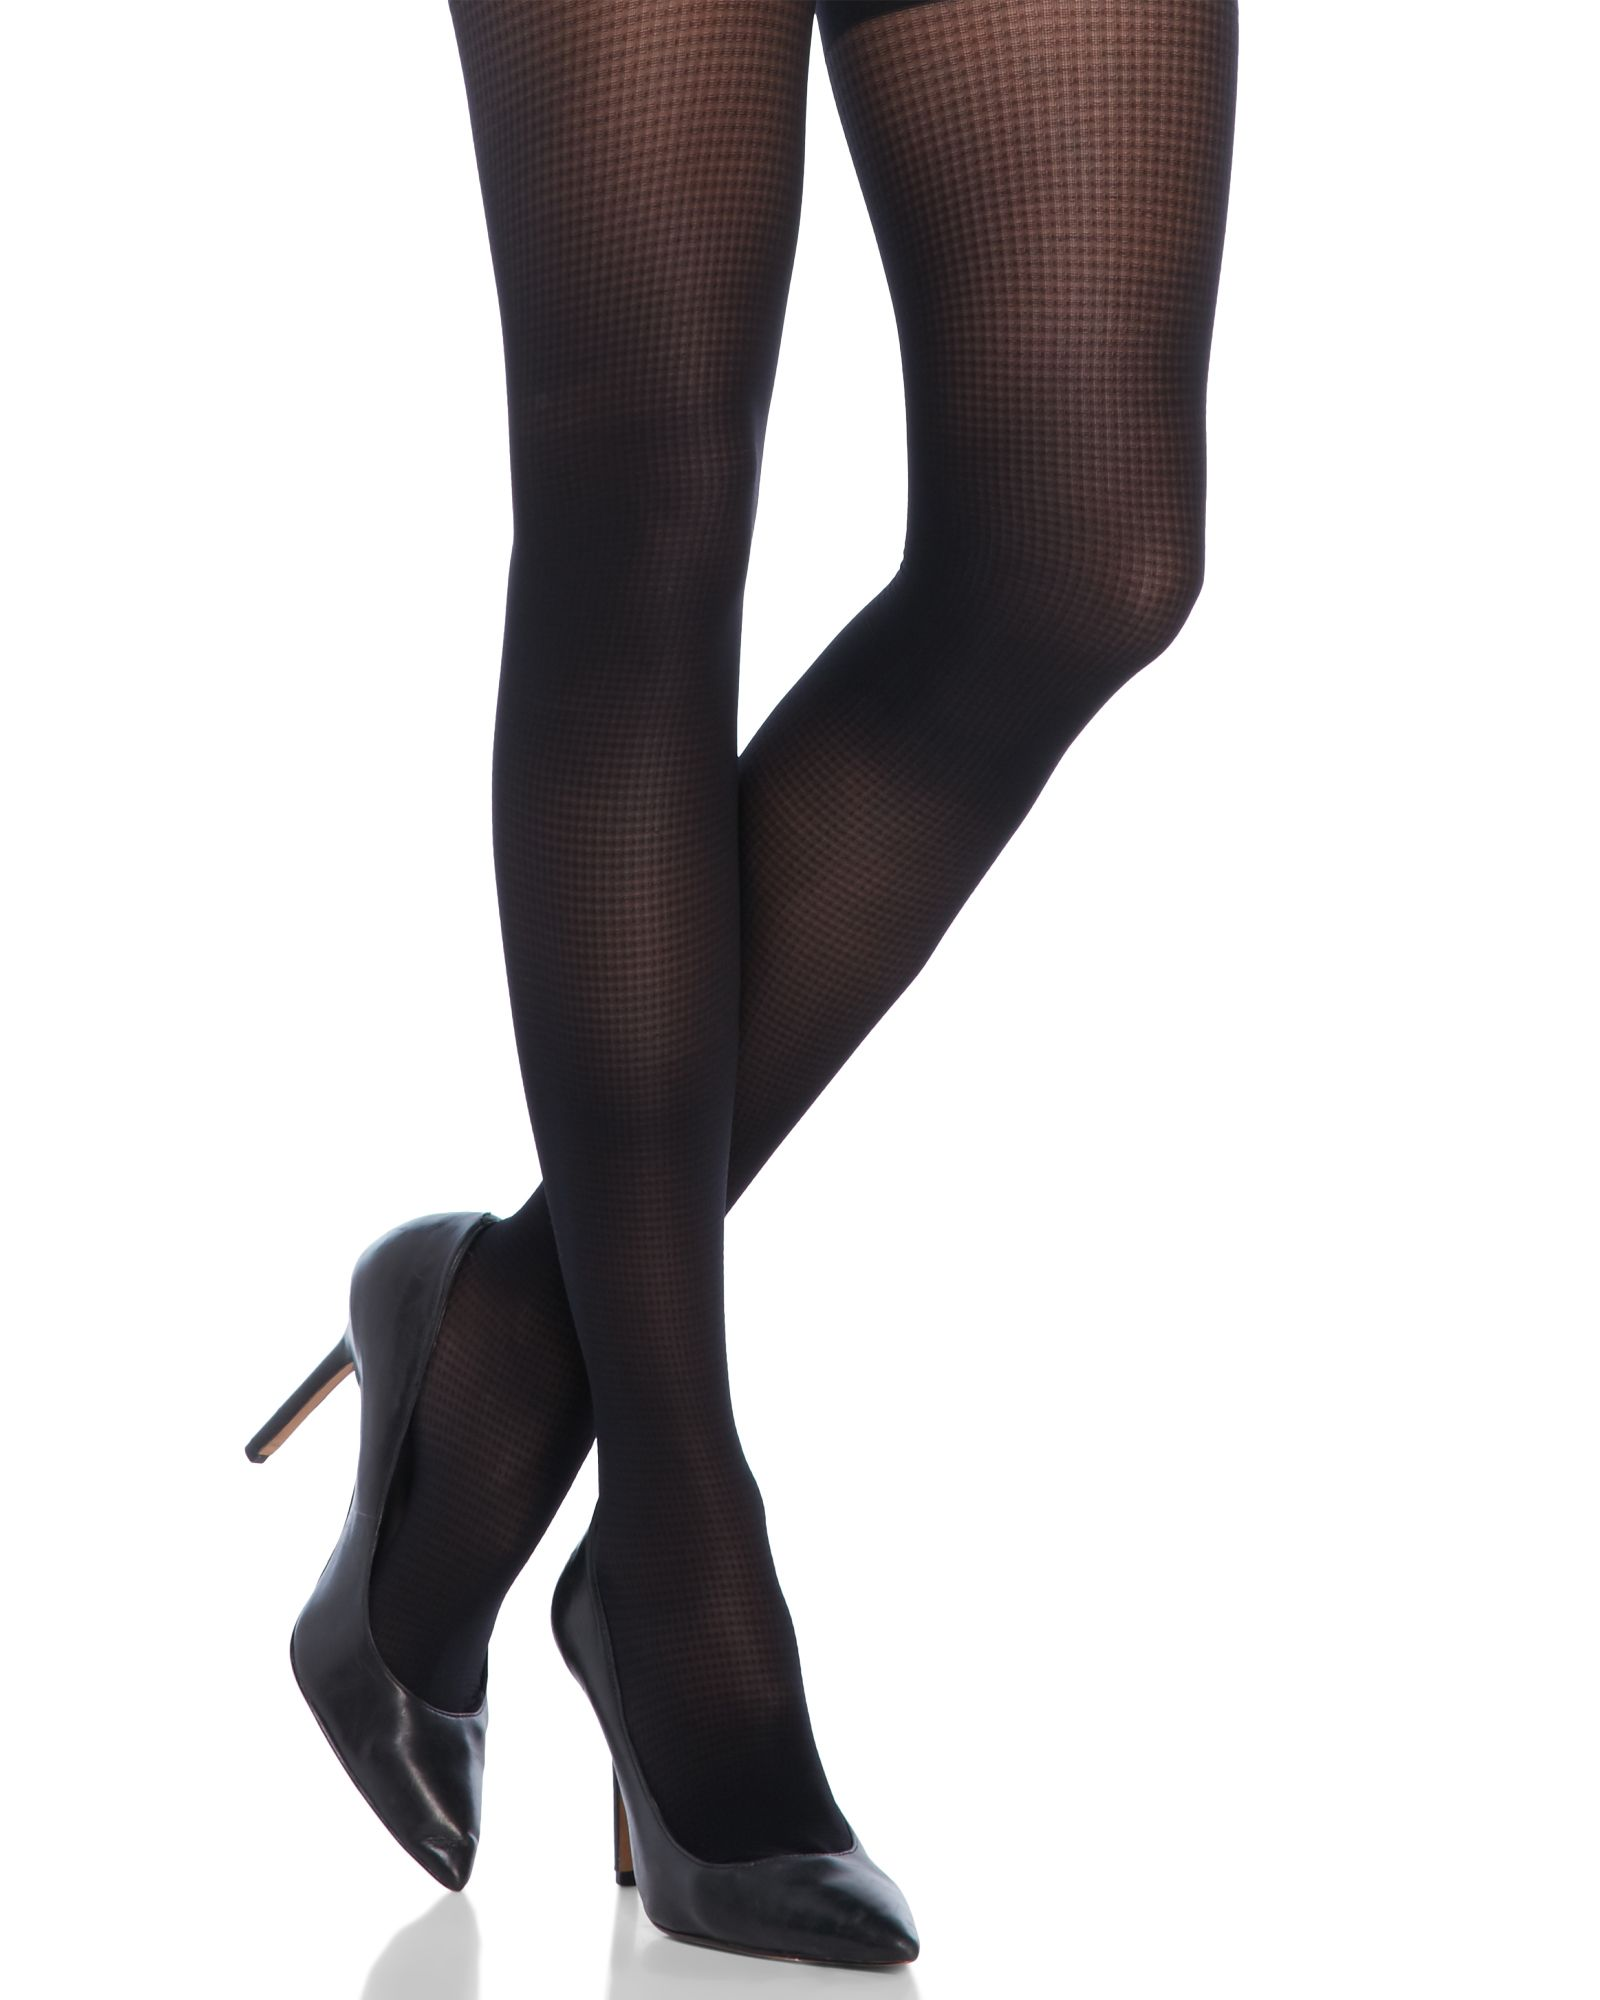 Ebony navy pantyhose